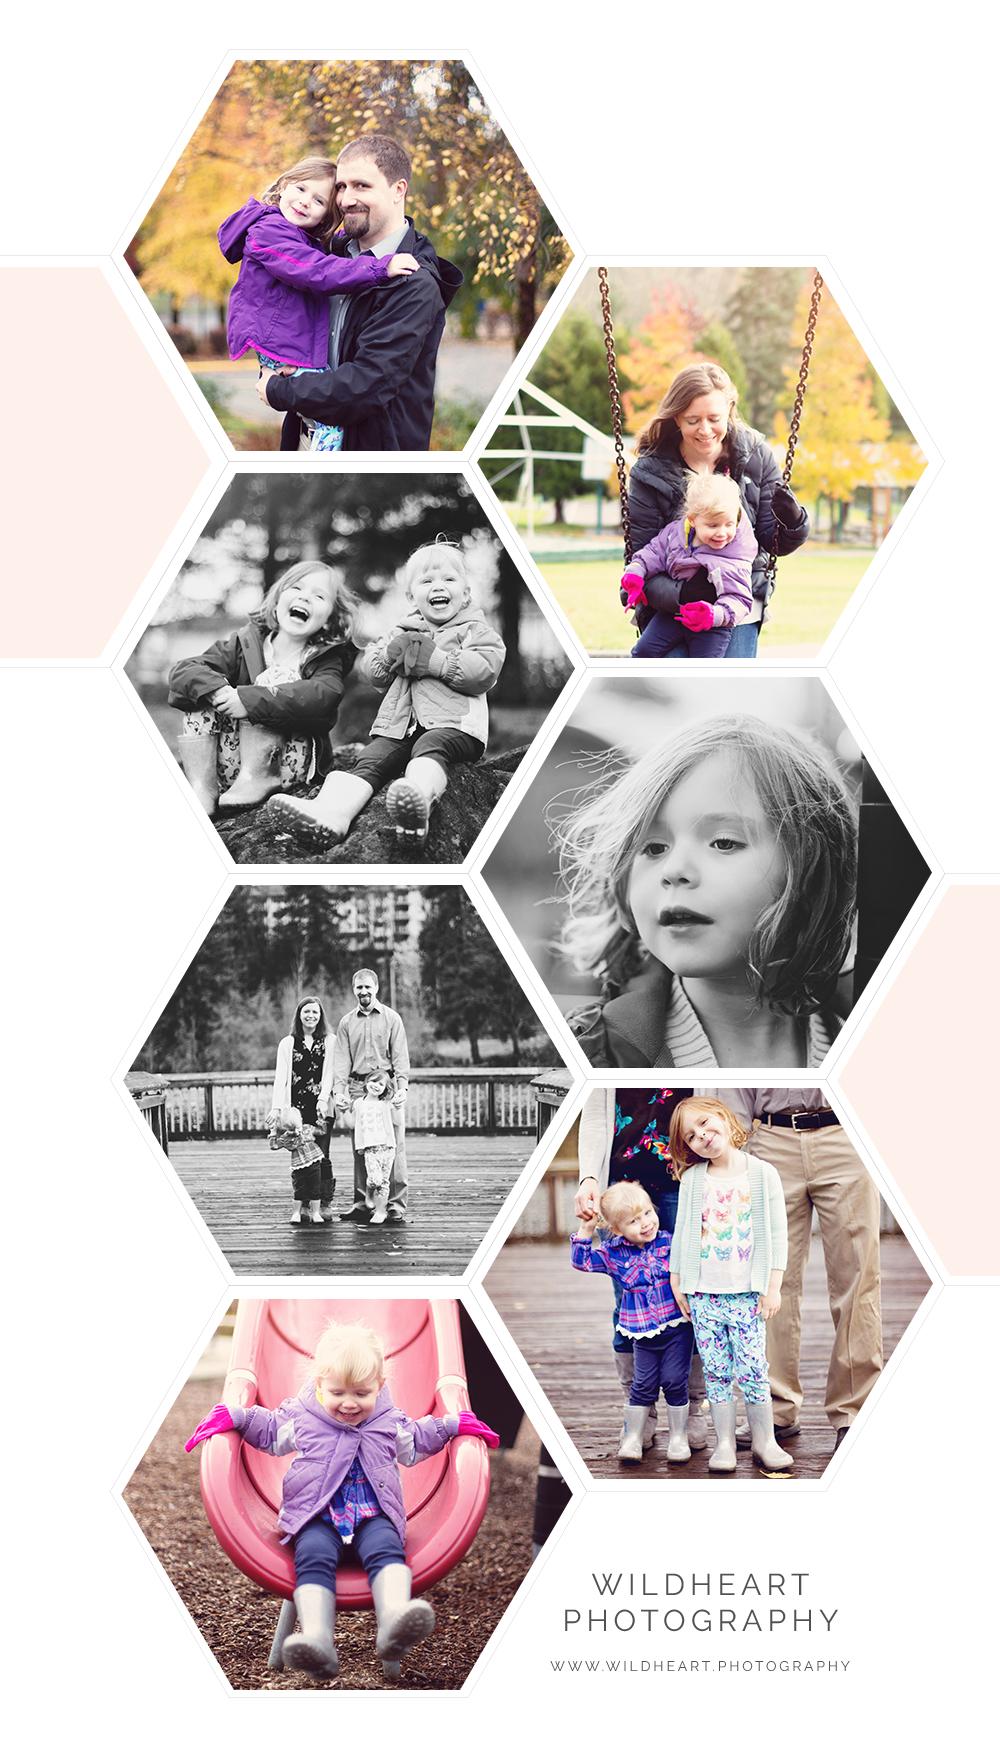 abernathy_family_collage1.jpg